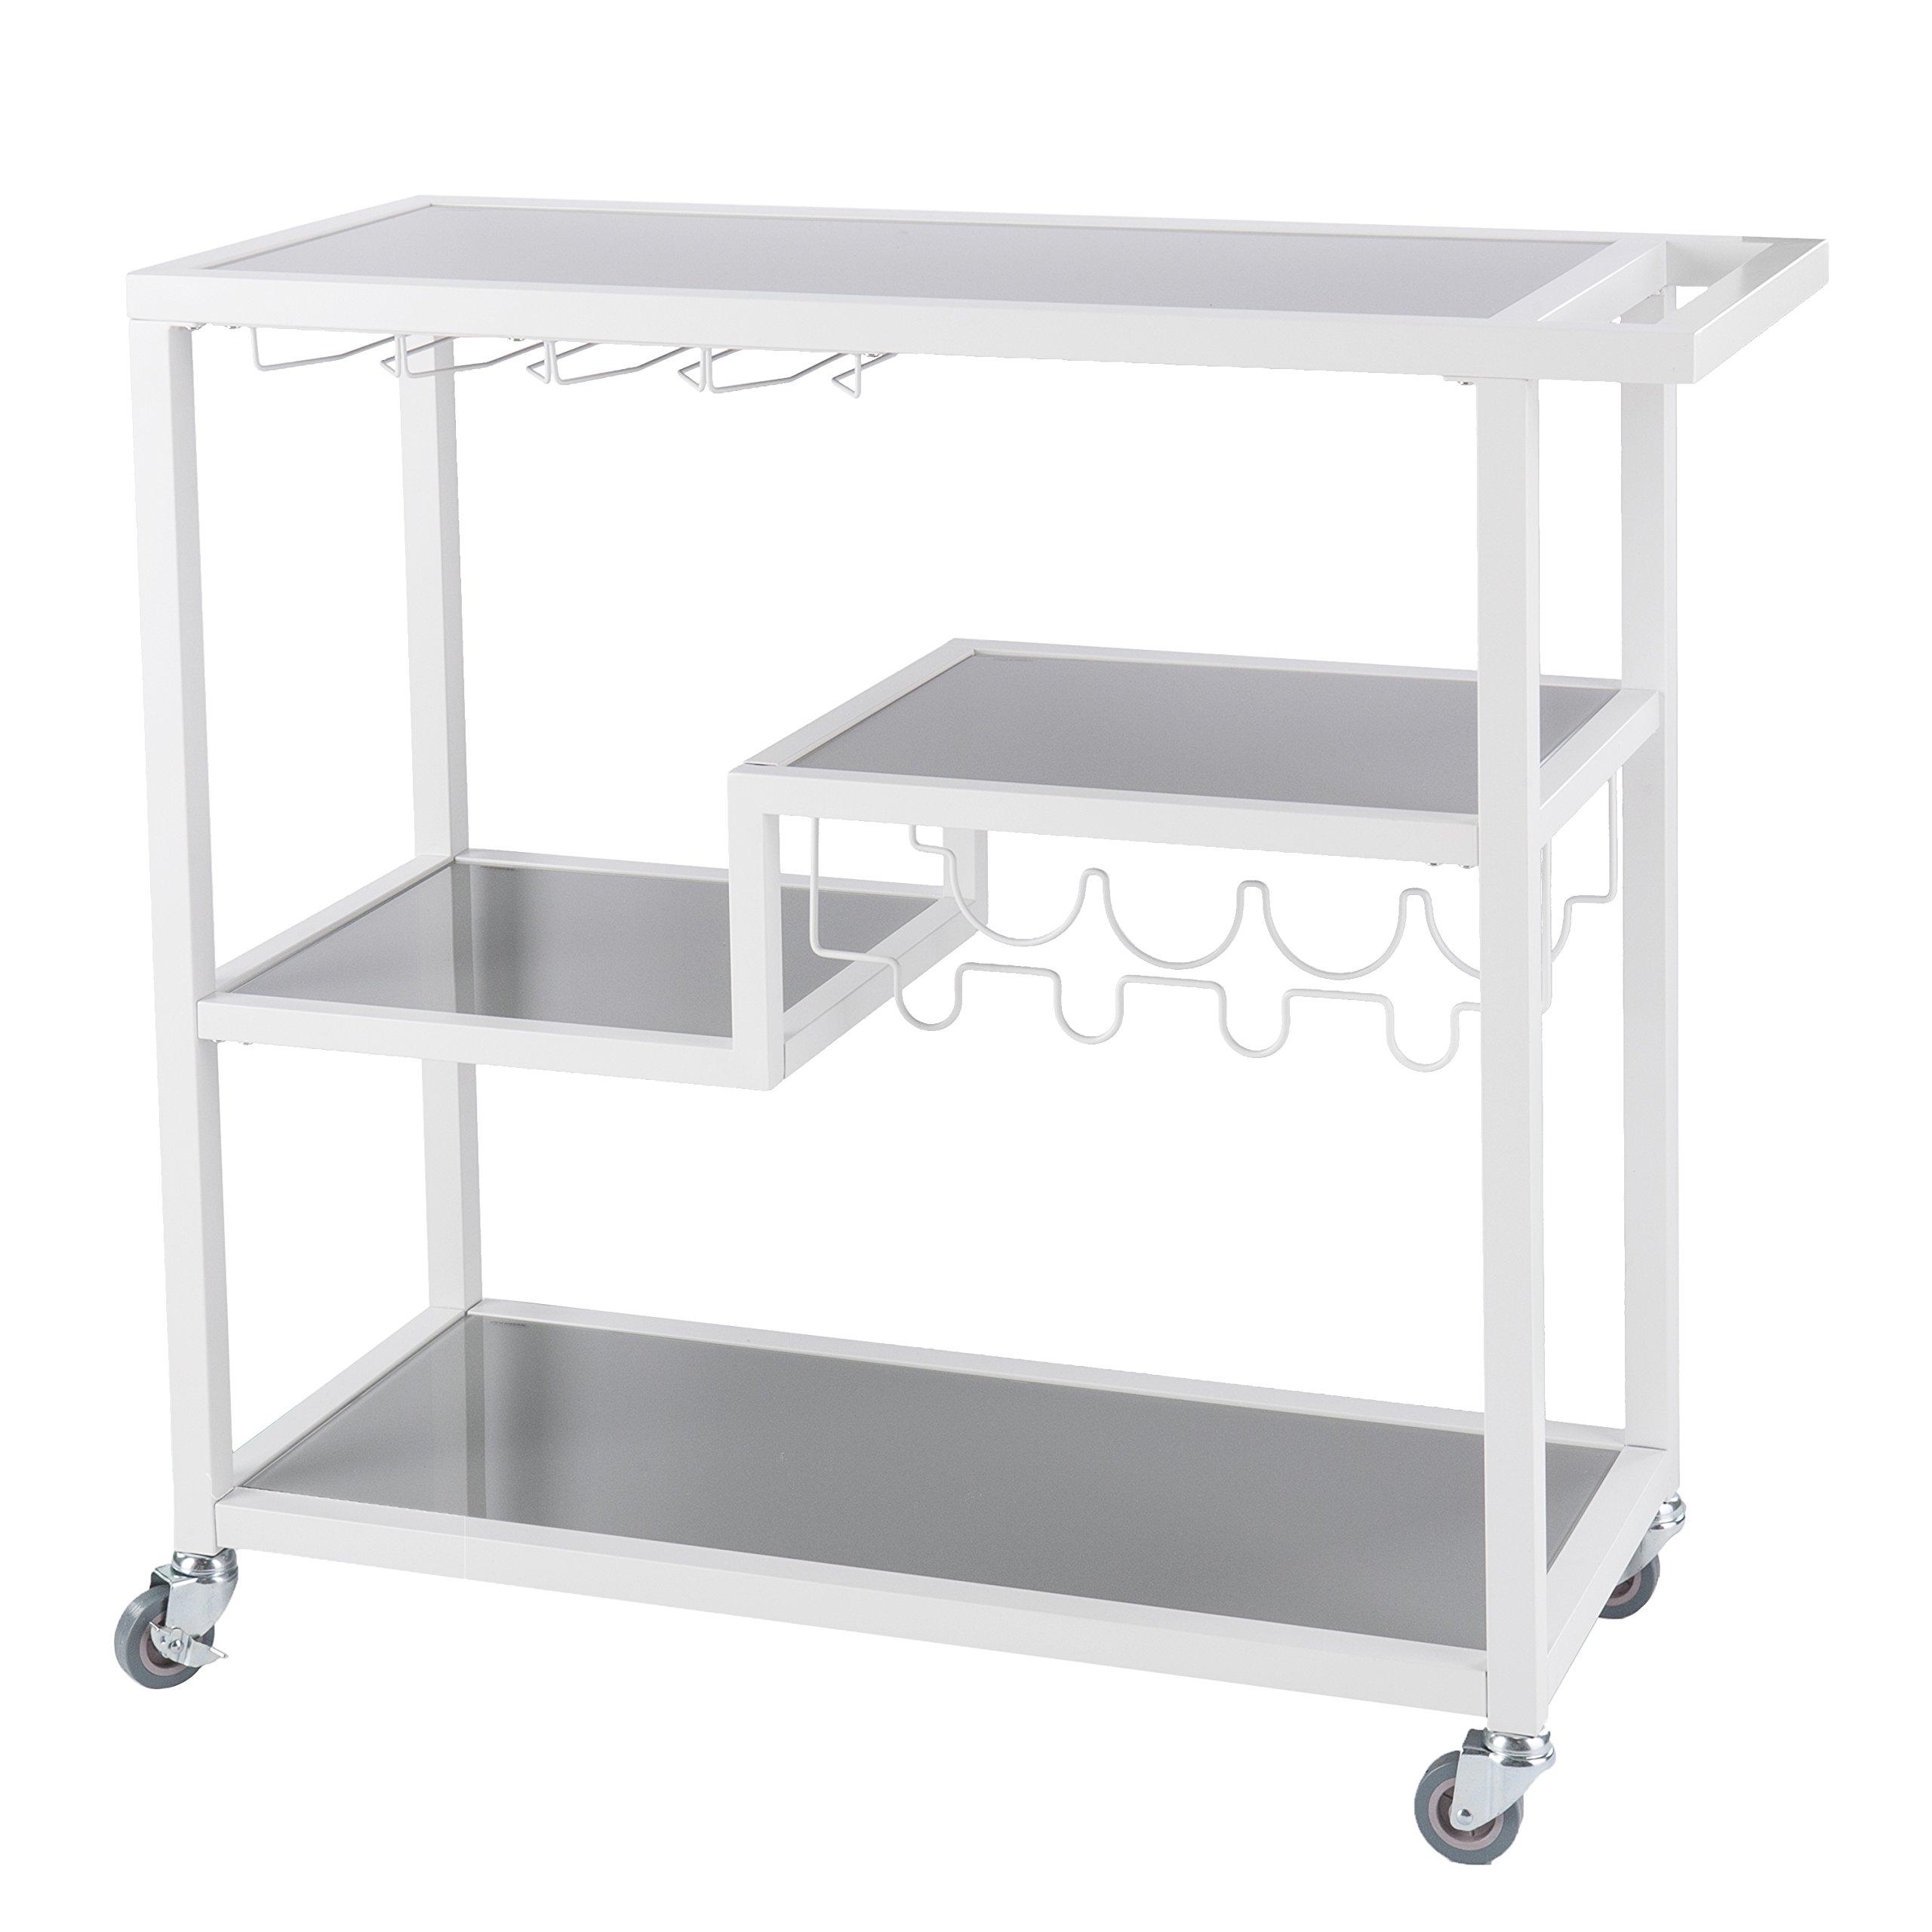 Southern Enterprises Zephs Rolling Bar Cart - Locking Castor Wheels - Smoky Gray Finish w/White Tempered Glass by Southern Enterprises